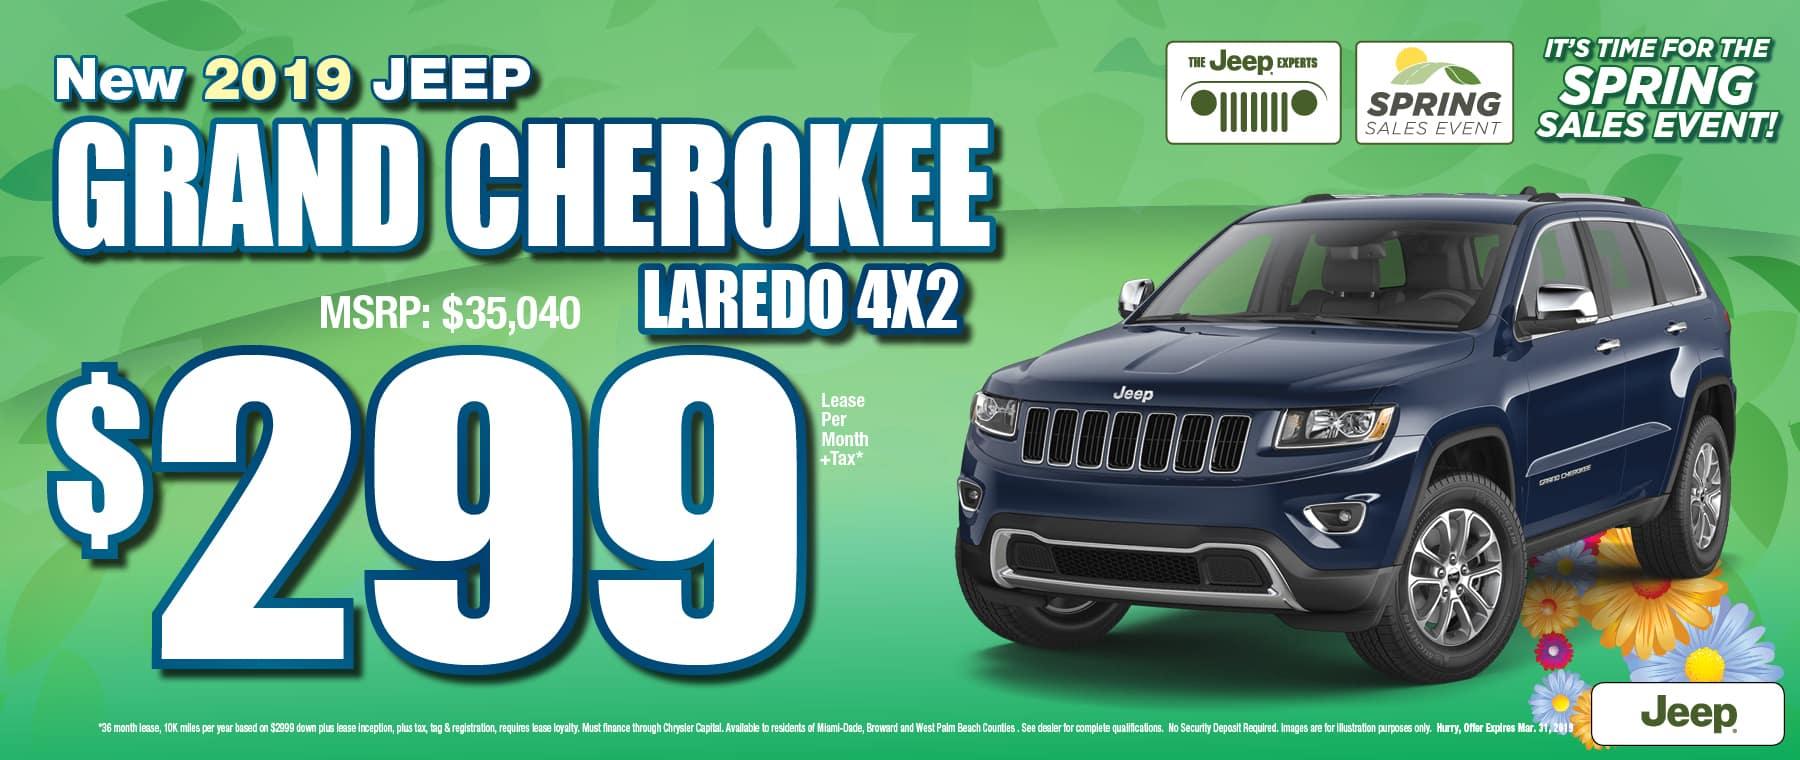 2019 Grand Cherokee Laredo  4x2 $299 Lease